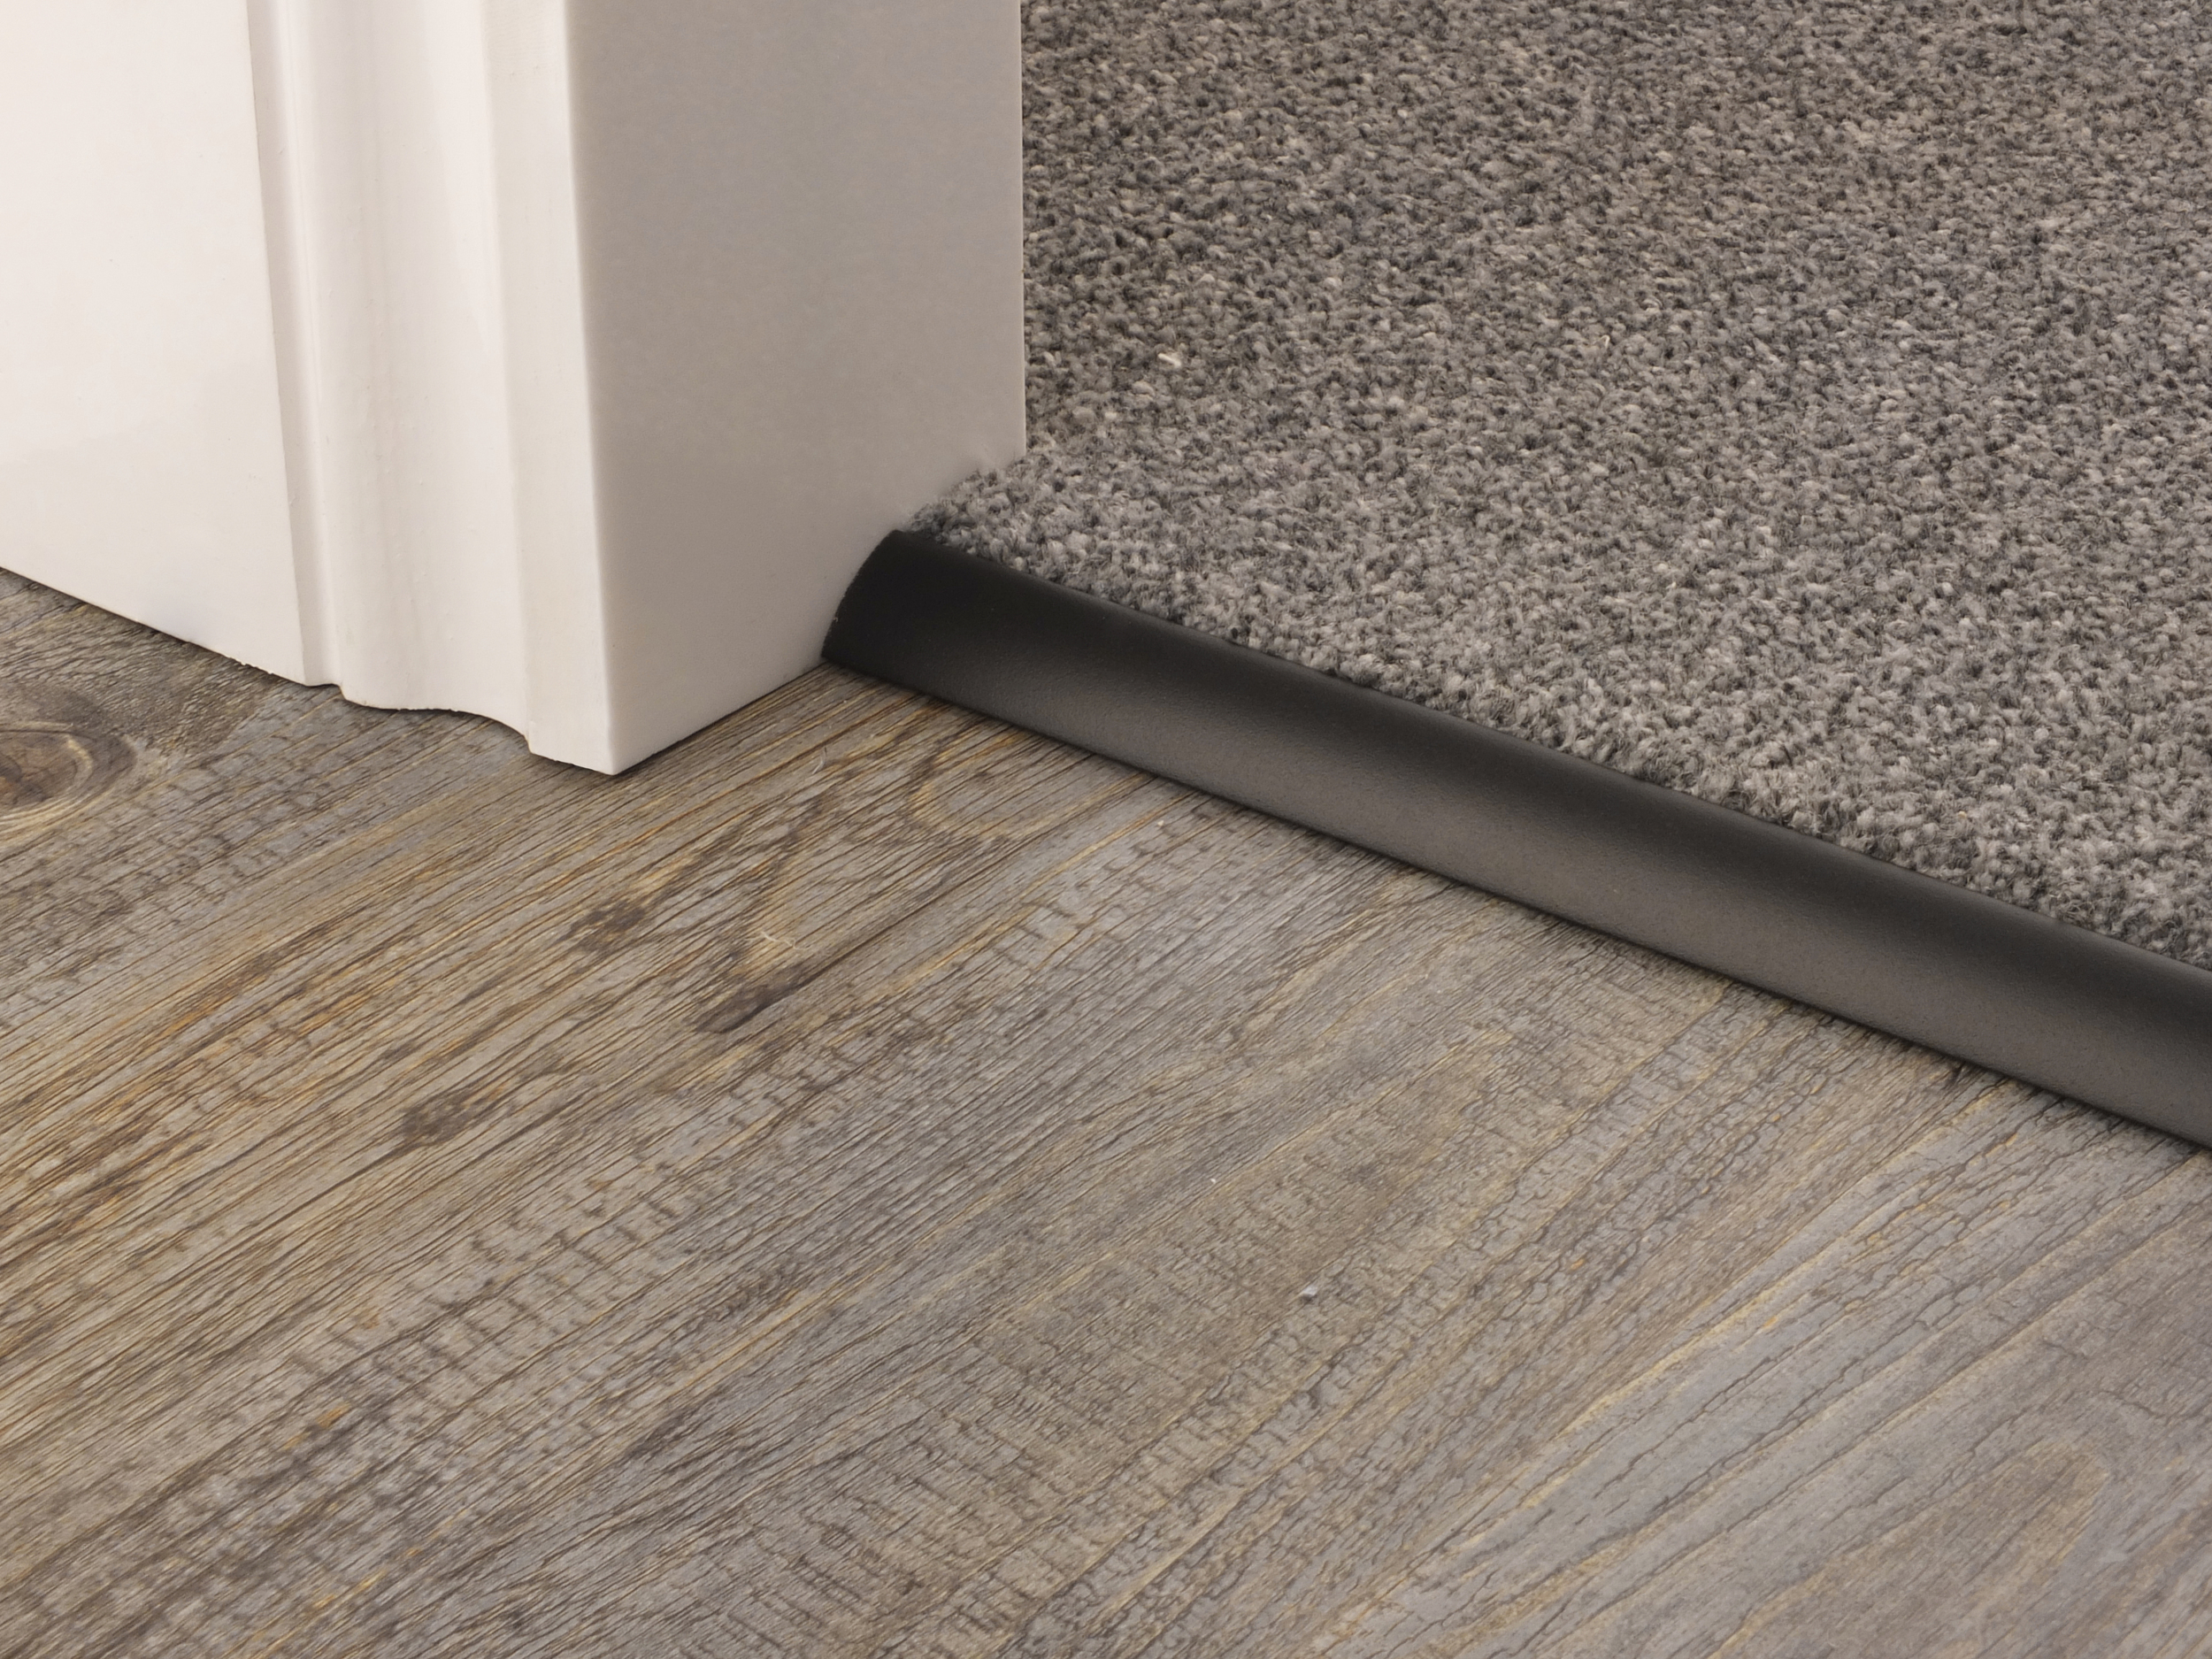 Single Carpet Edge Carpet to Hardfloor